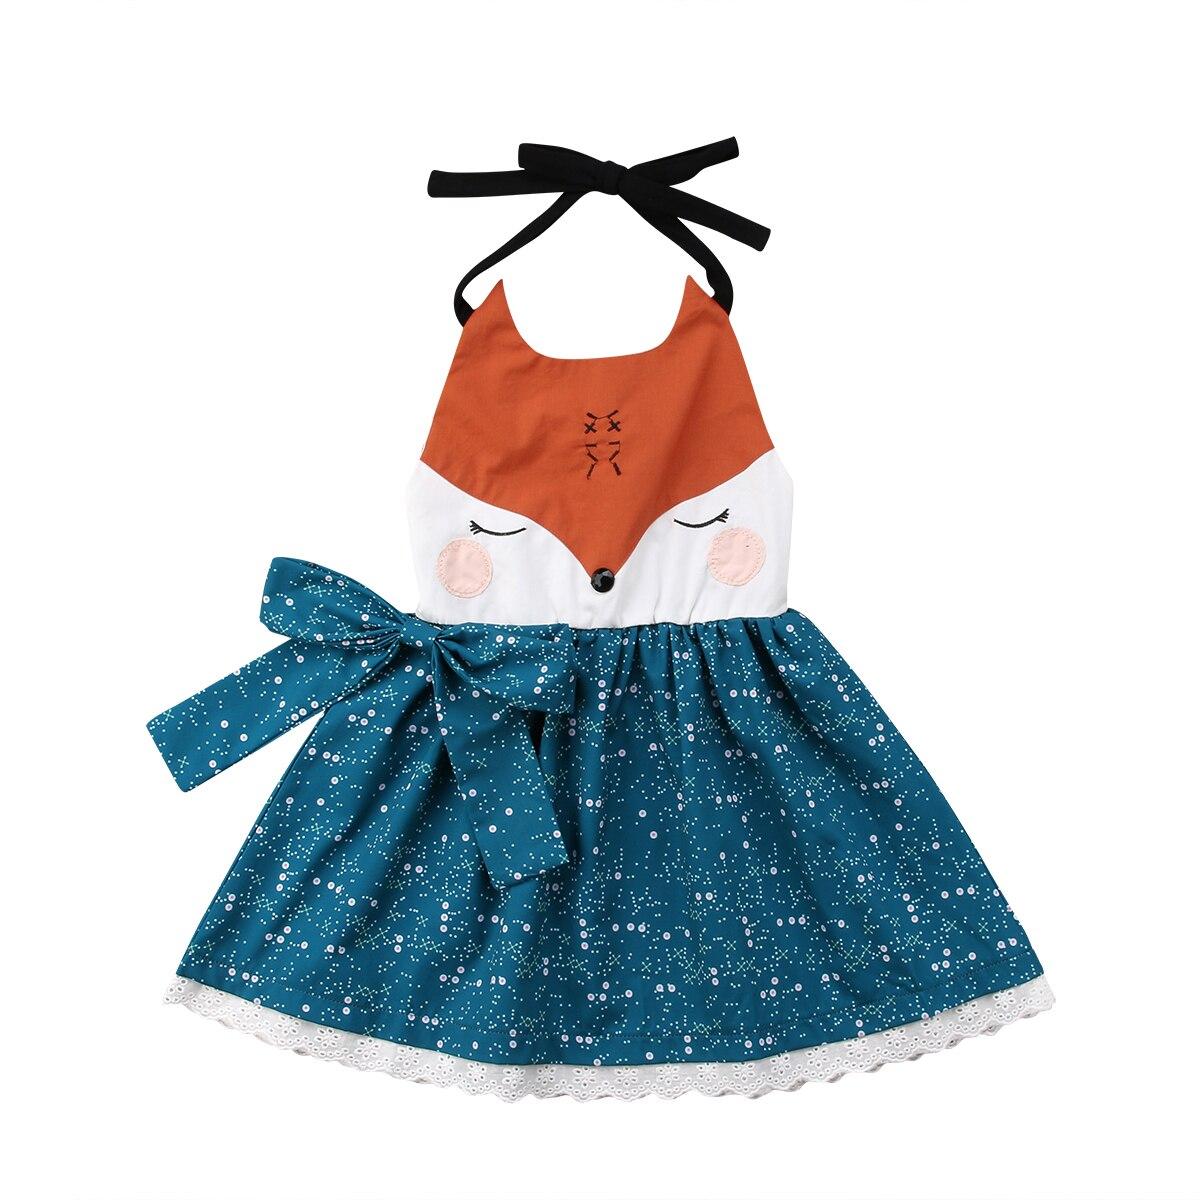 Pudcoco Princess Dress Newborn Infant Baby Girls Halter Cotton Fox Dress Sundress halter vintage pin up dress